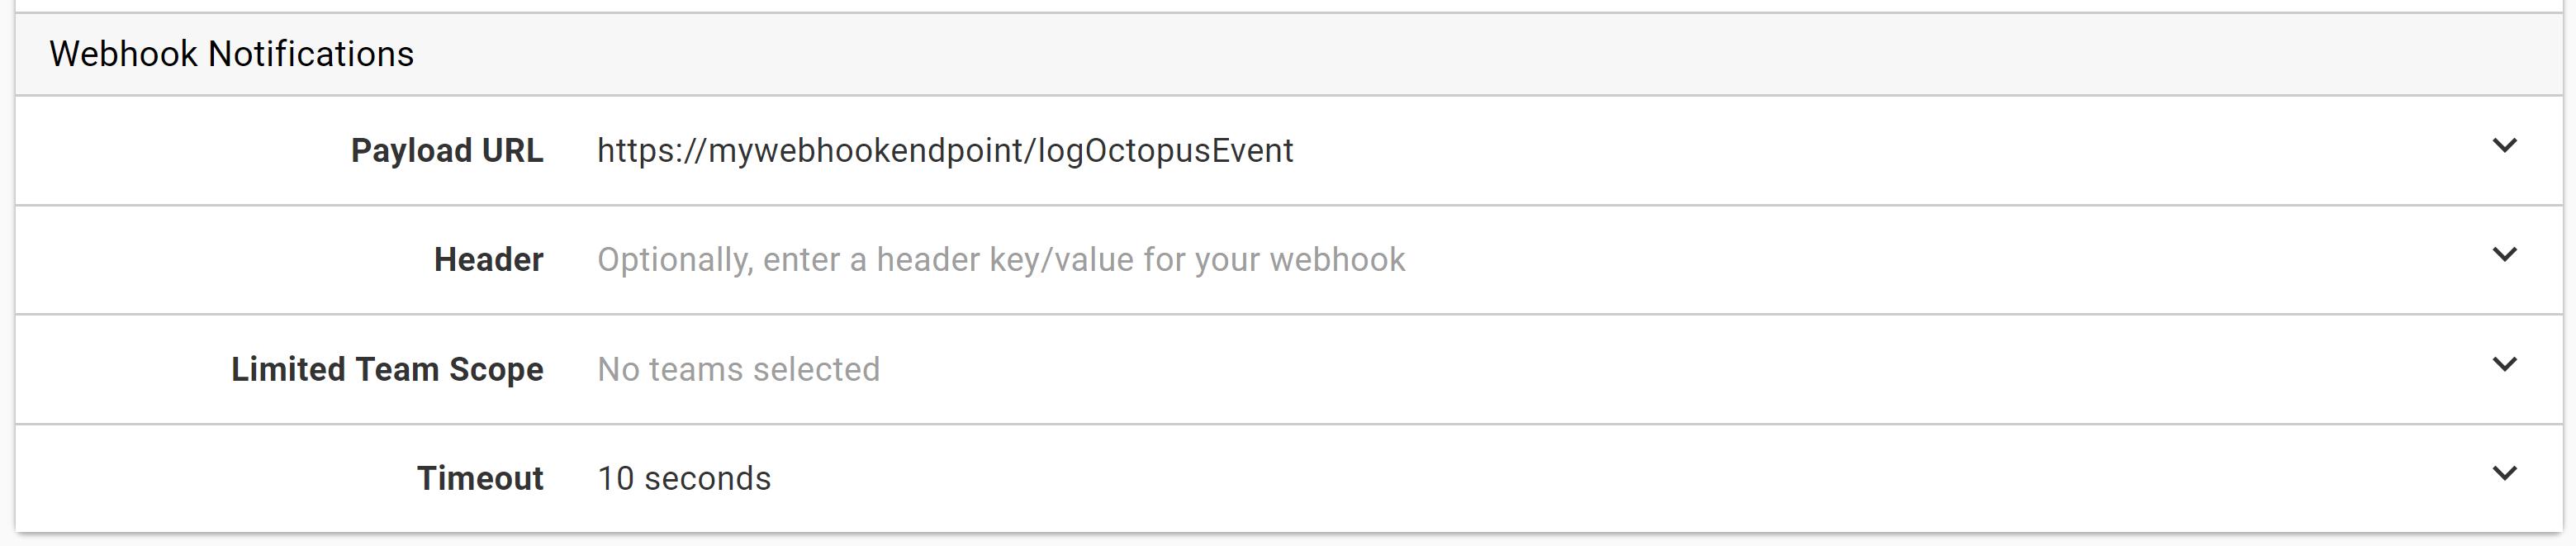 Subscription webhook settings